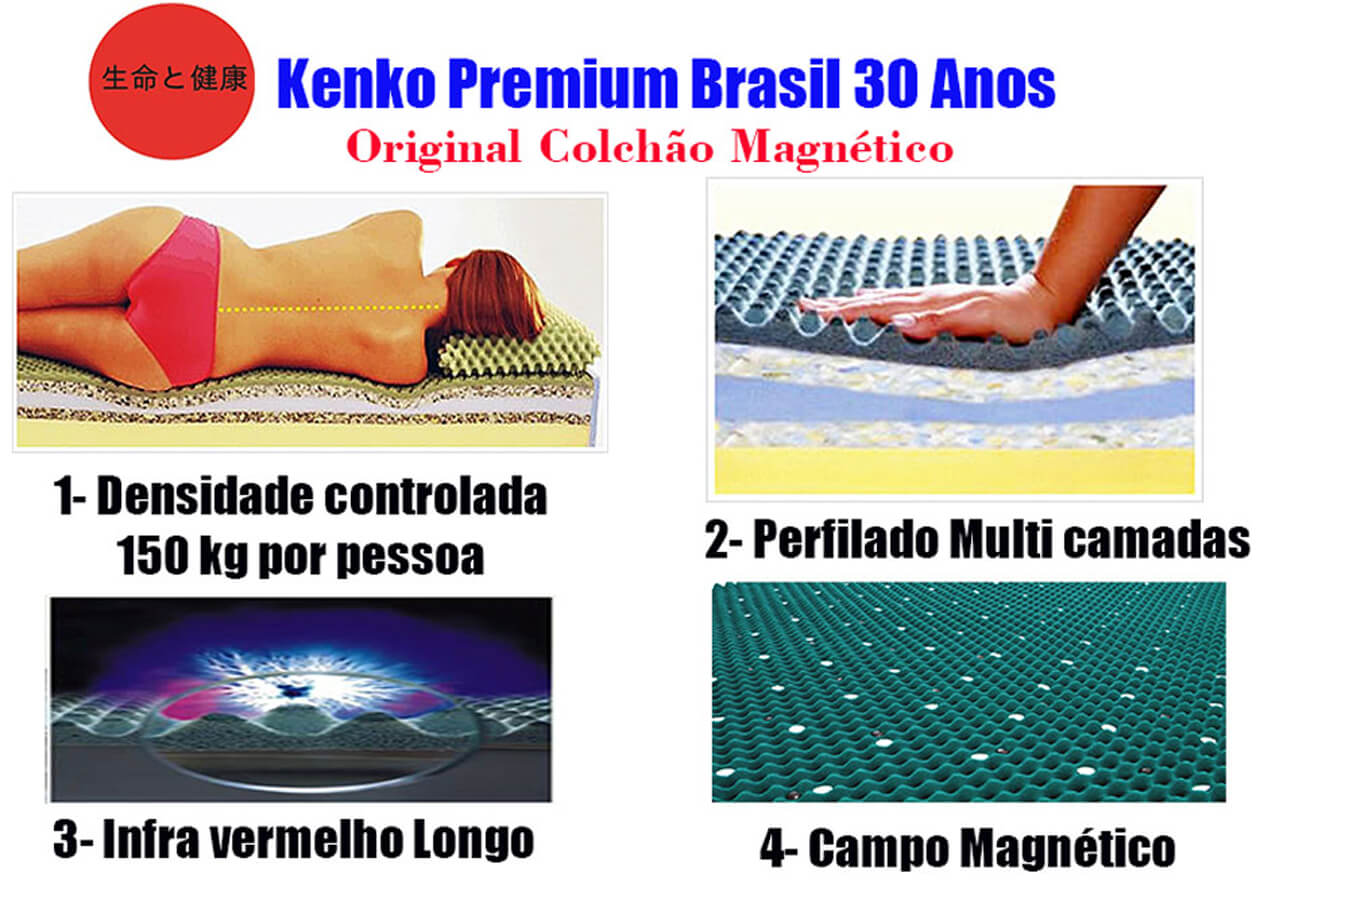 Colchão Magnético Queen Size Kenko Premium Standart  1,58x1,98x25cm  - Kenko Premium Colchões